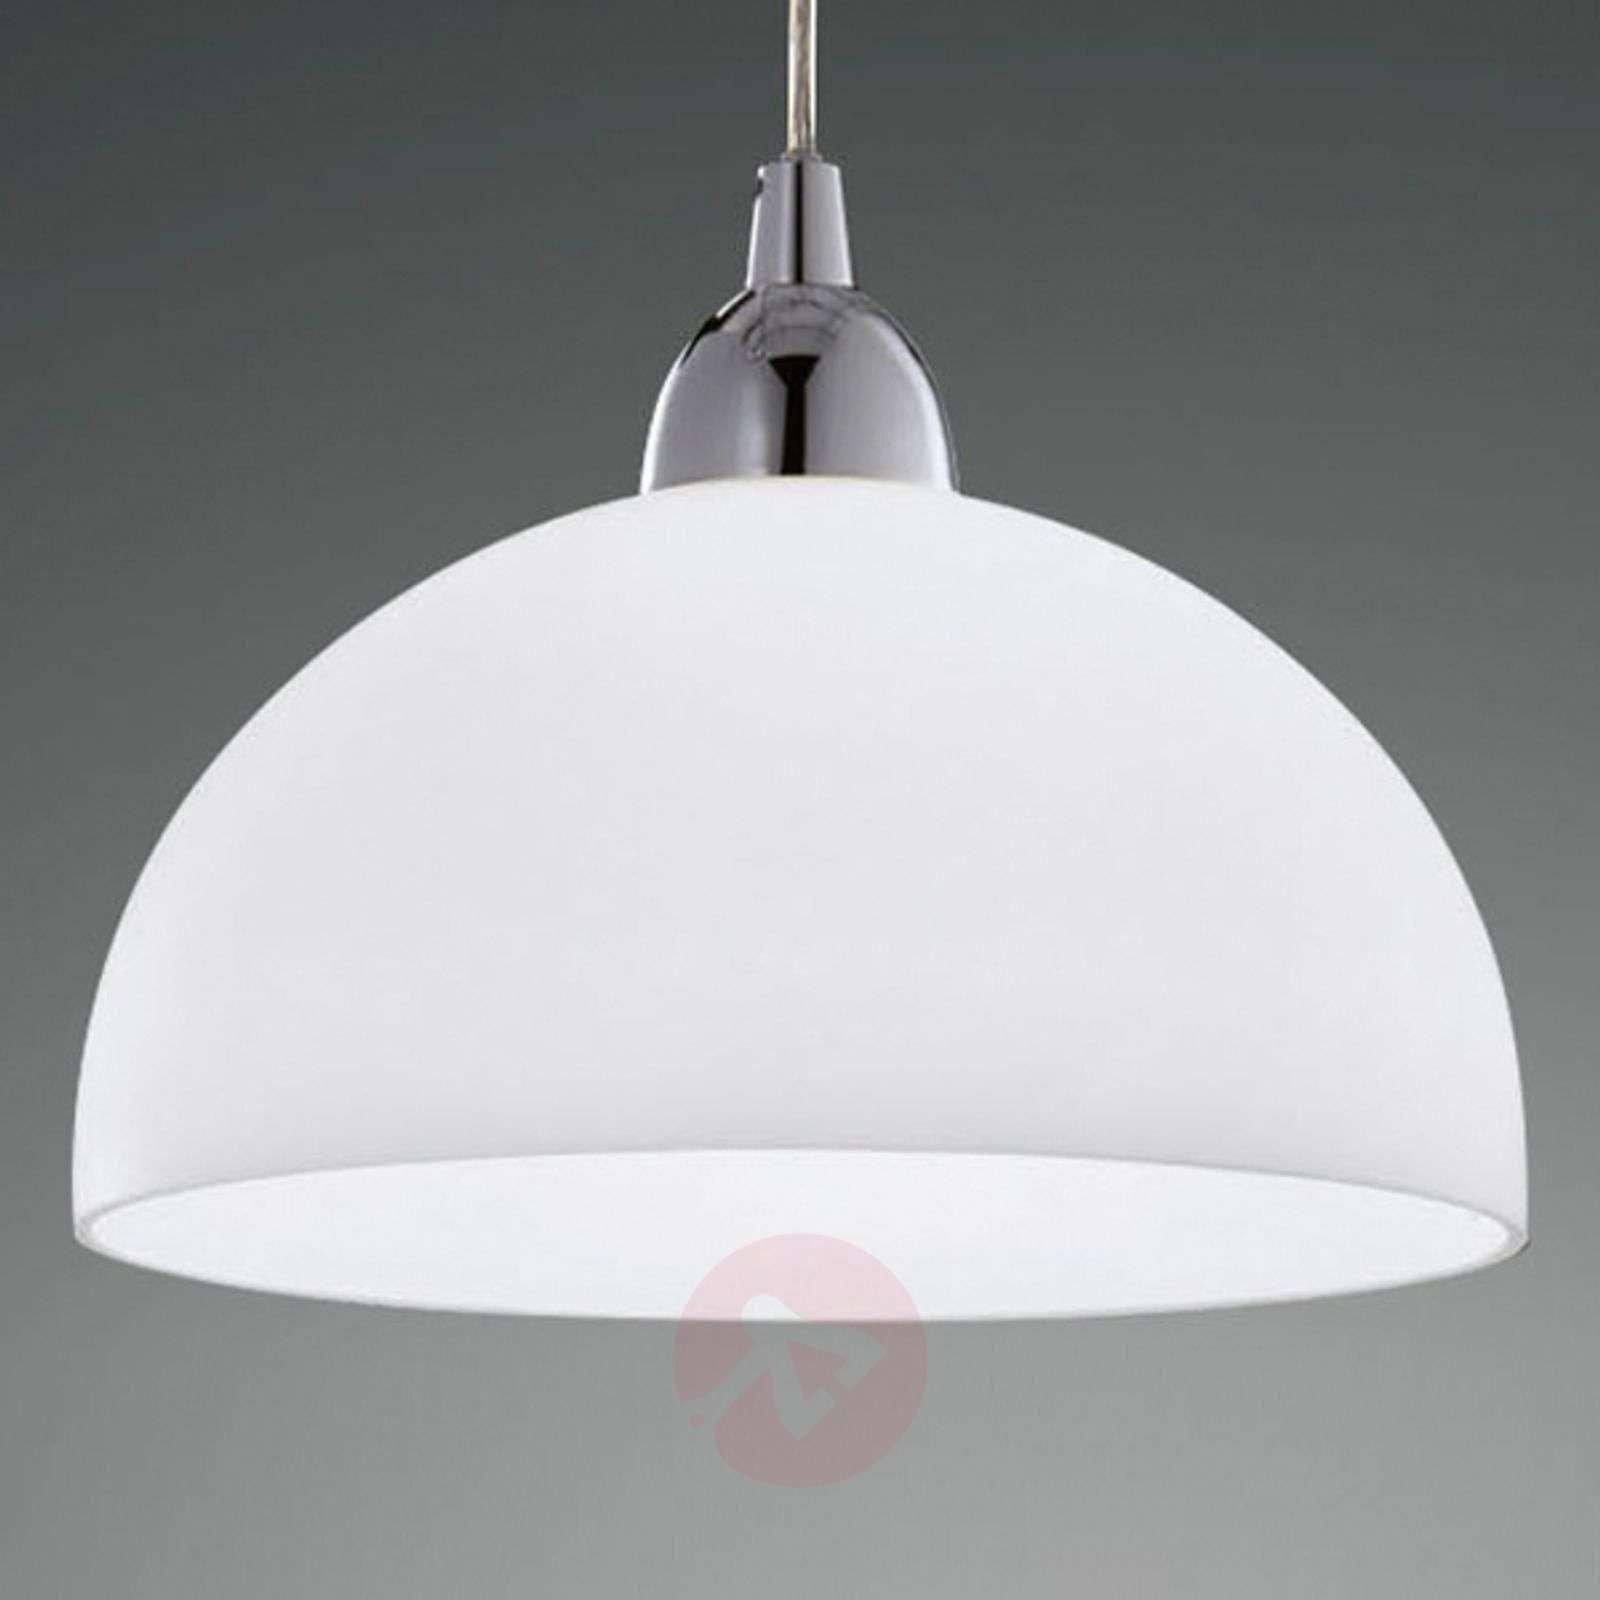 Glass nice pendant light white lights glass nice pendant light white 26 cm 3502588 01 aloadofball Images